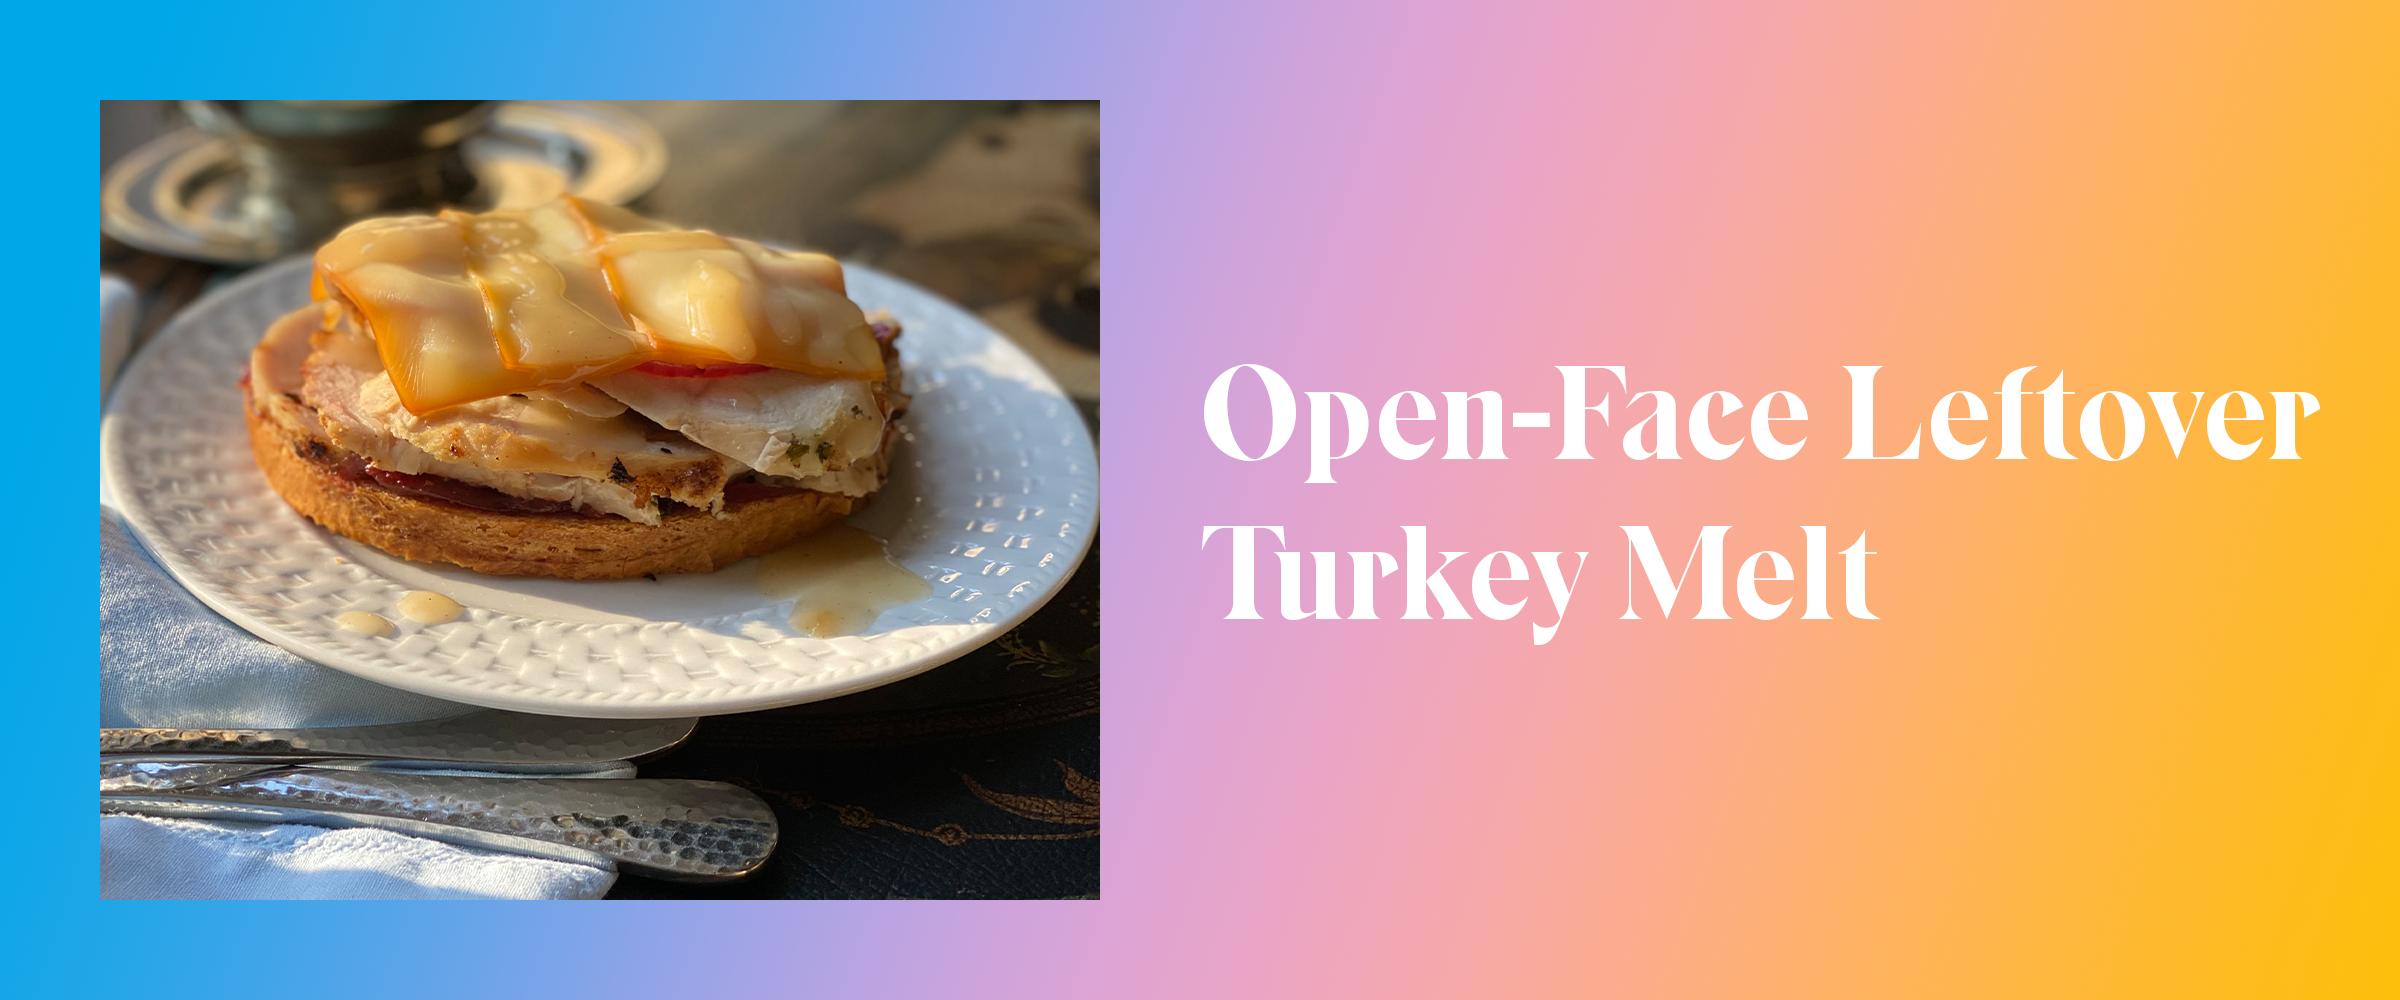 Open-Face Leftover Turkey Melt